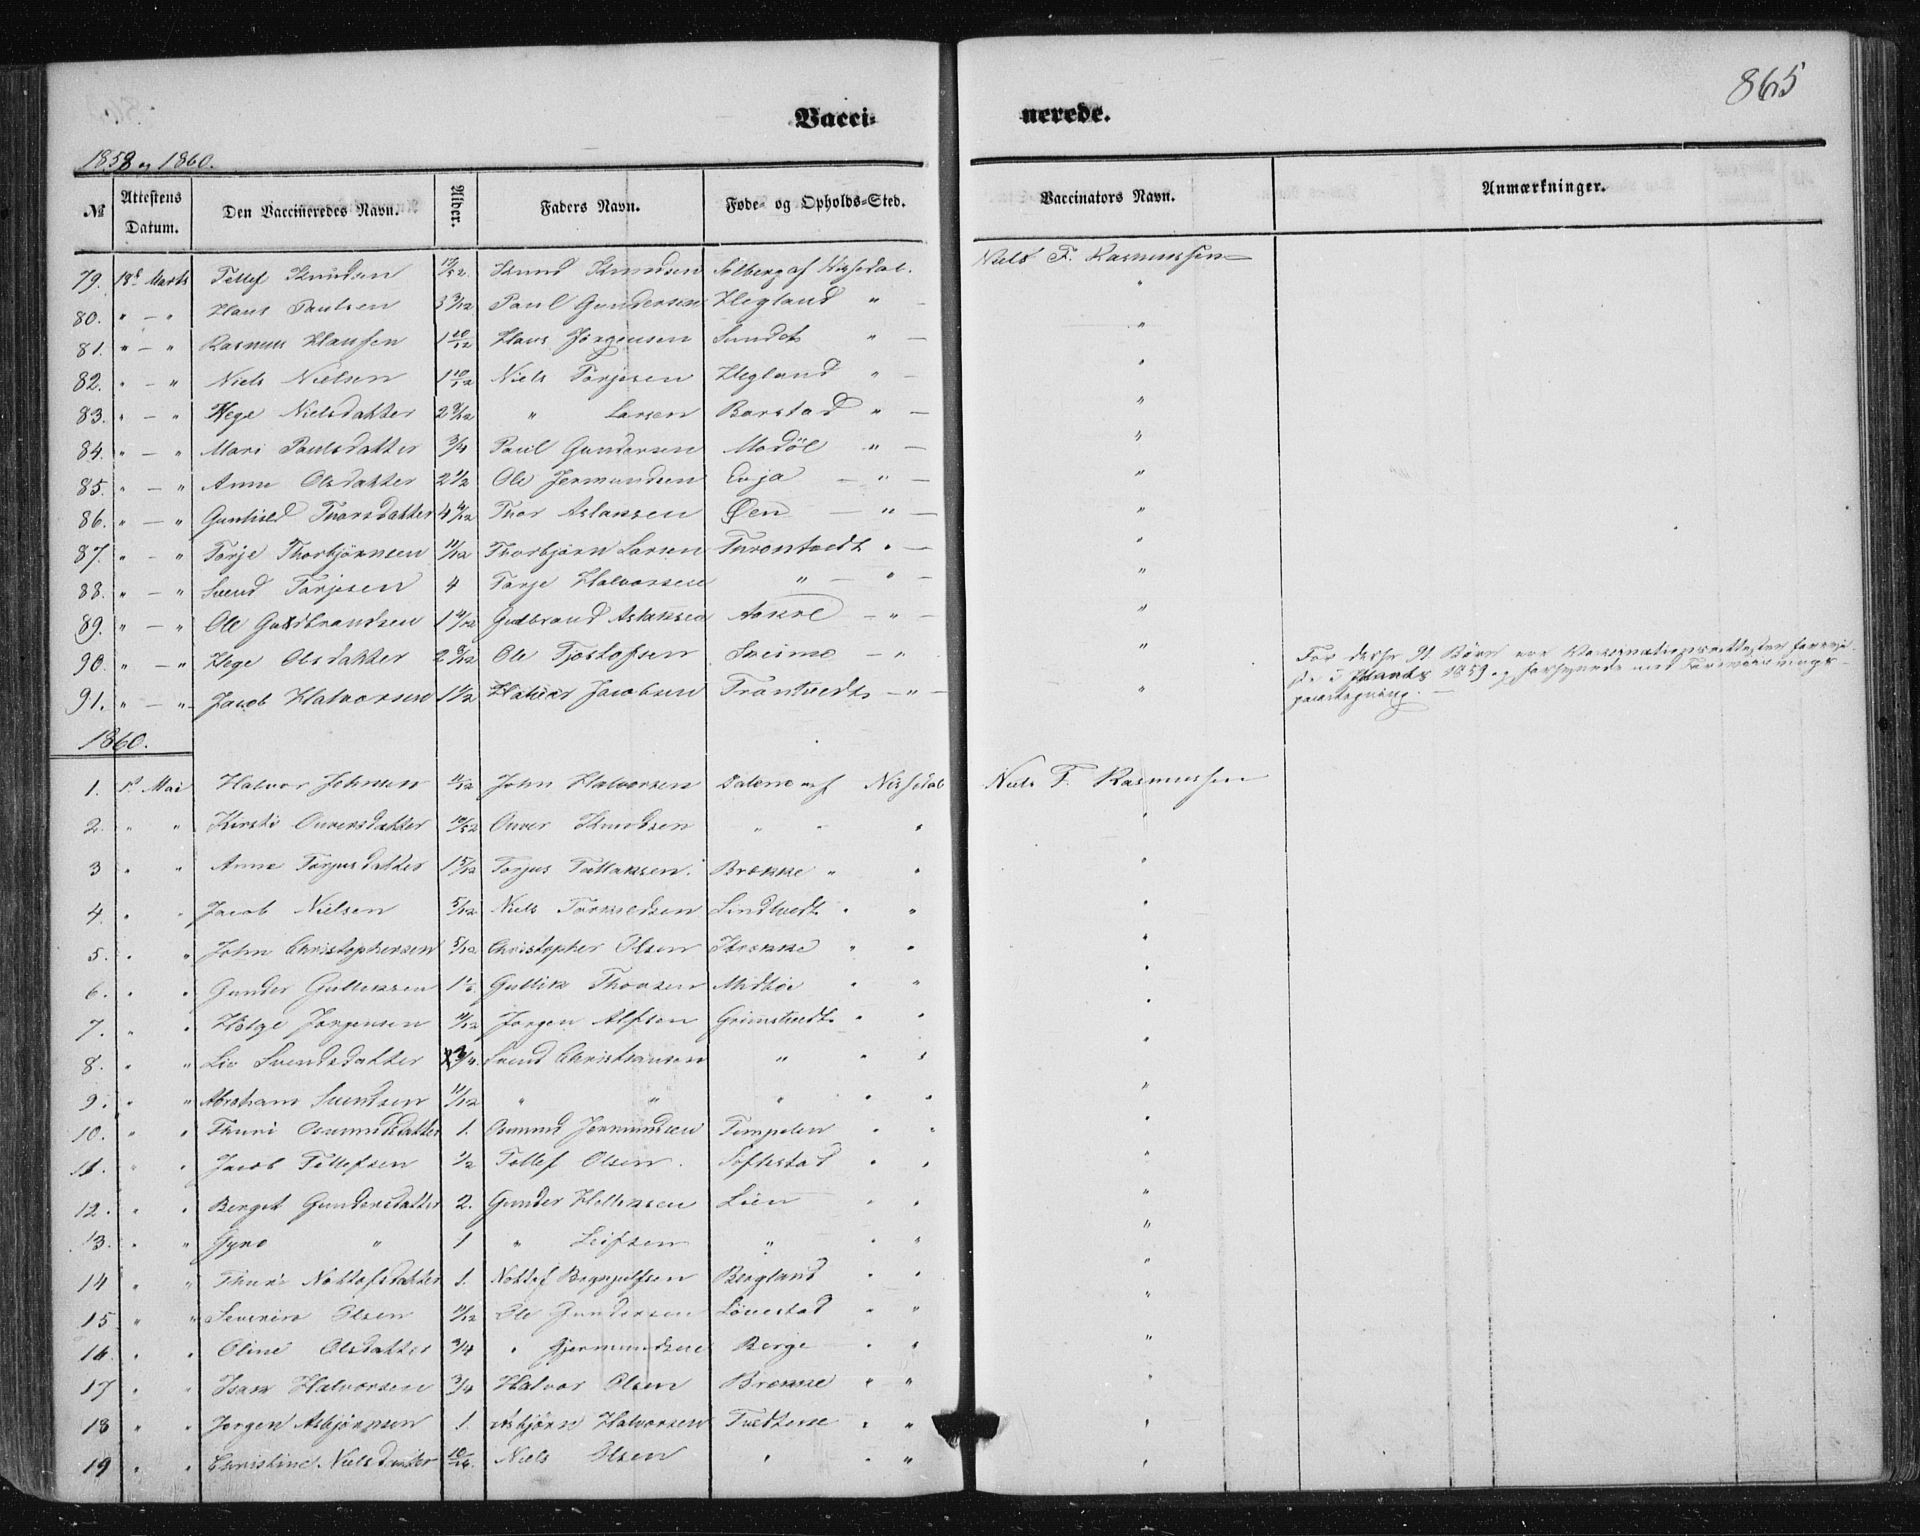 SAKO, Nissedal kirkebøker, F/Fa/L0003: Ministerialbok nr. I 3, 1846-1870, s. 864-865